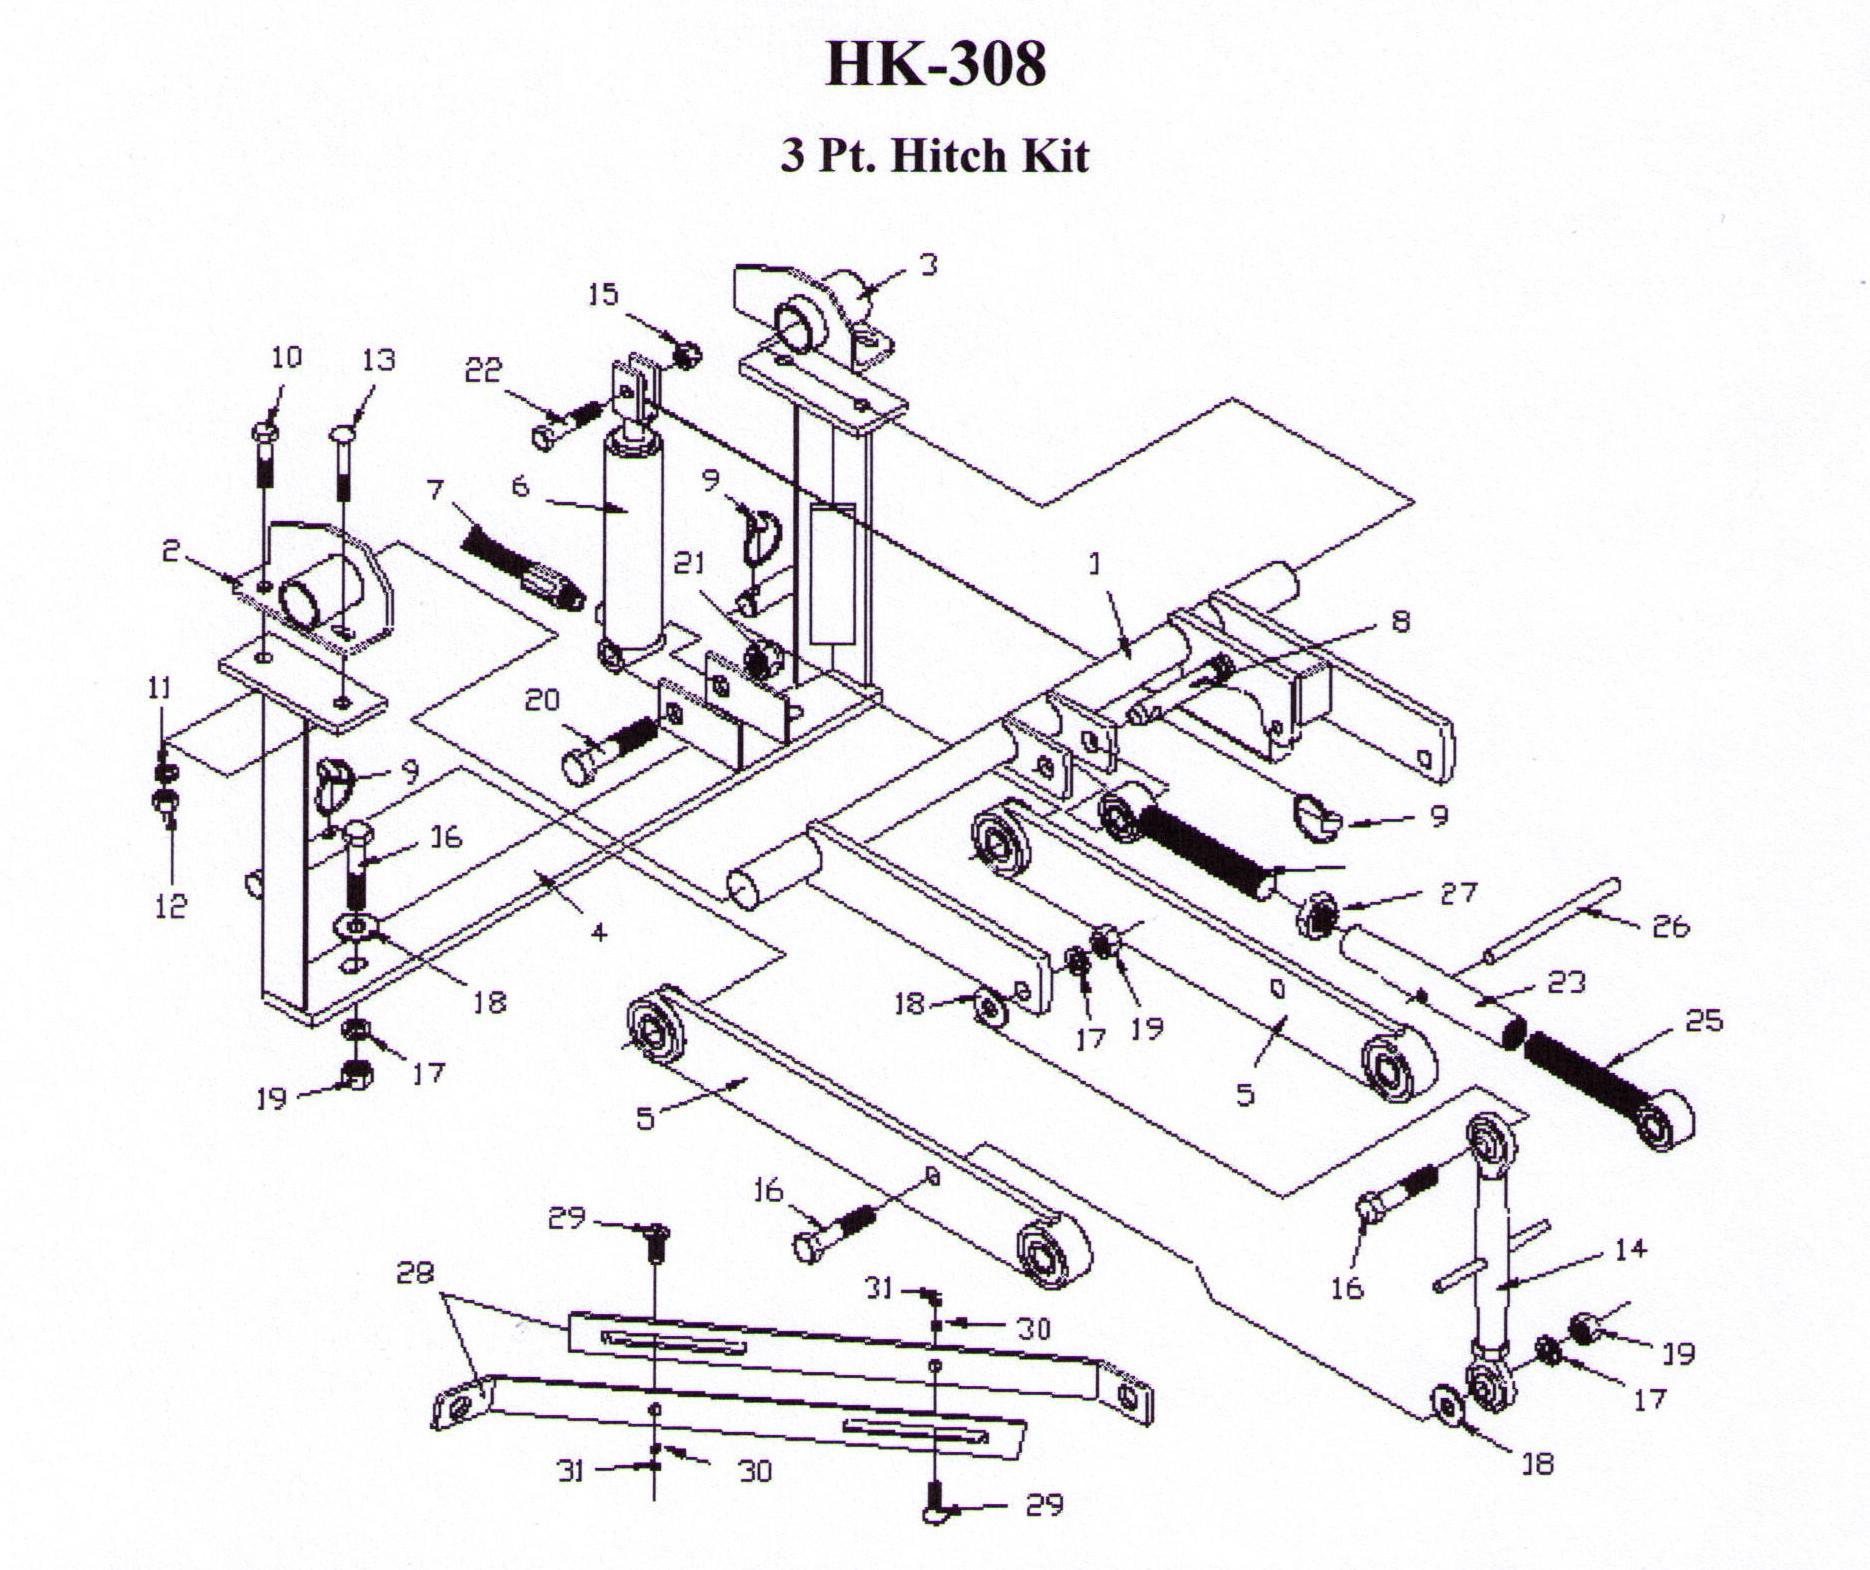 [DIAGRAM] 7060 Allis Chalmers Wiring Diagrams FULL Version